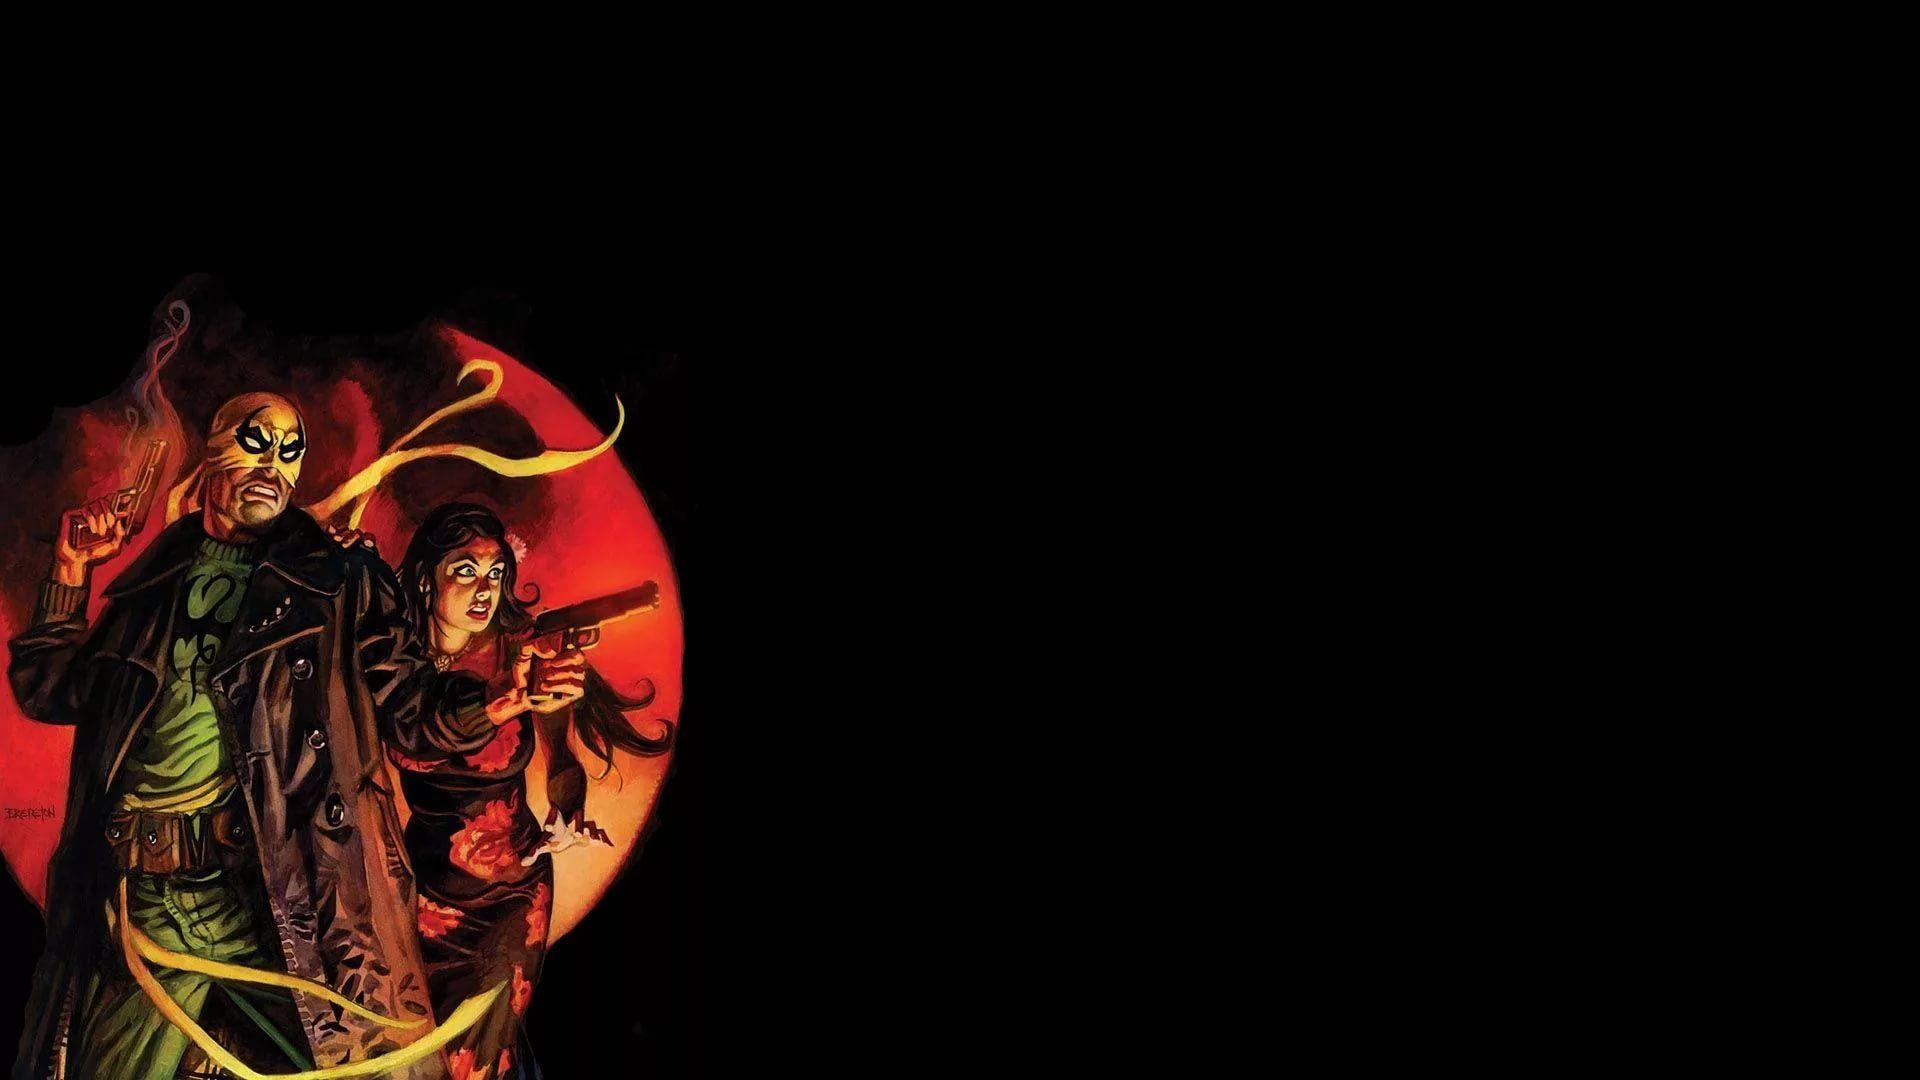 Iron Fist download wallpaper image